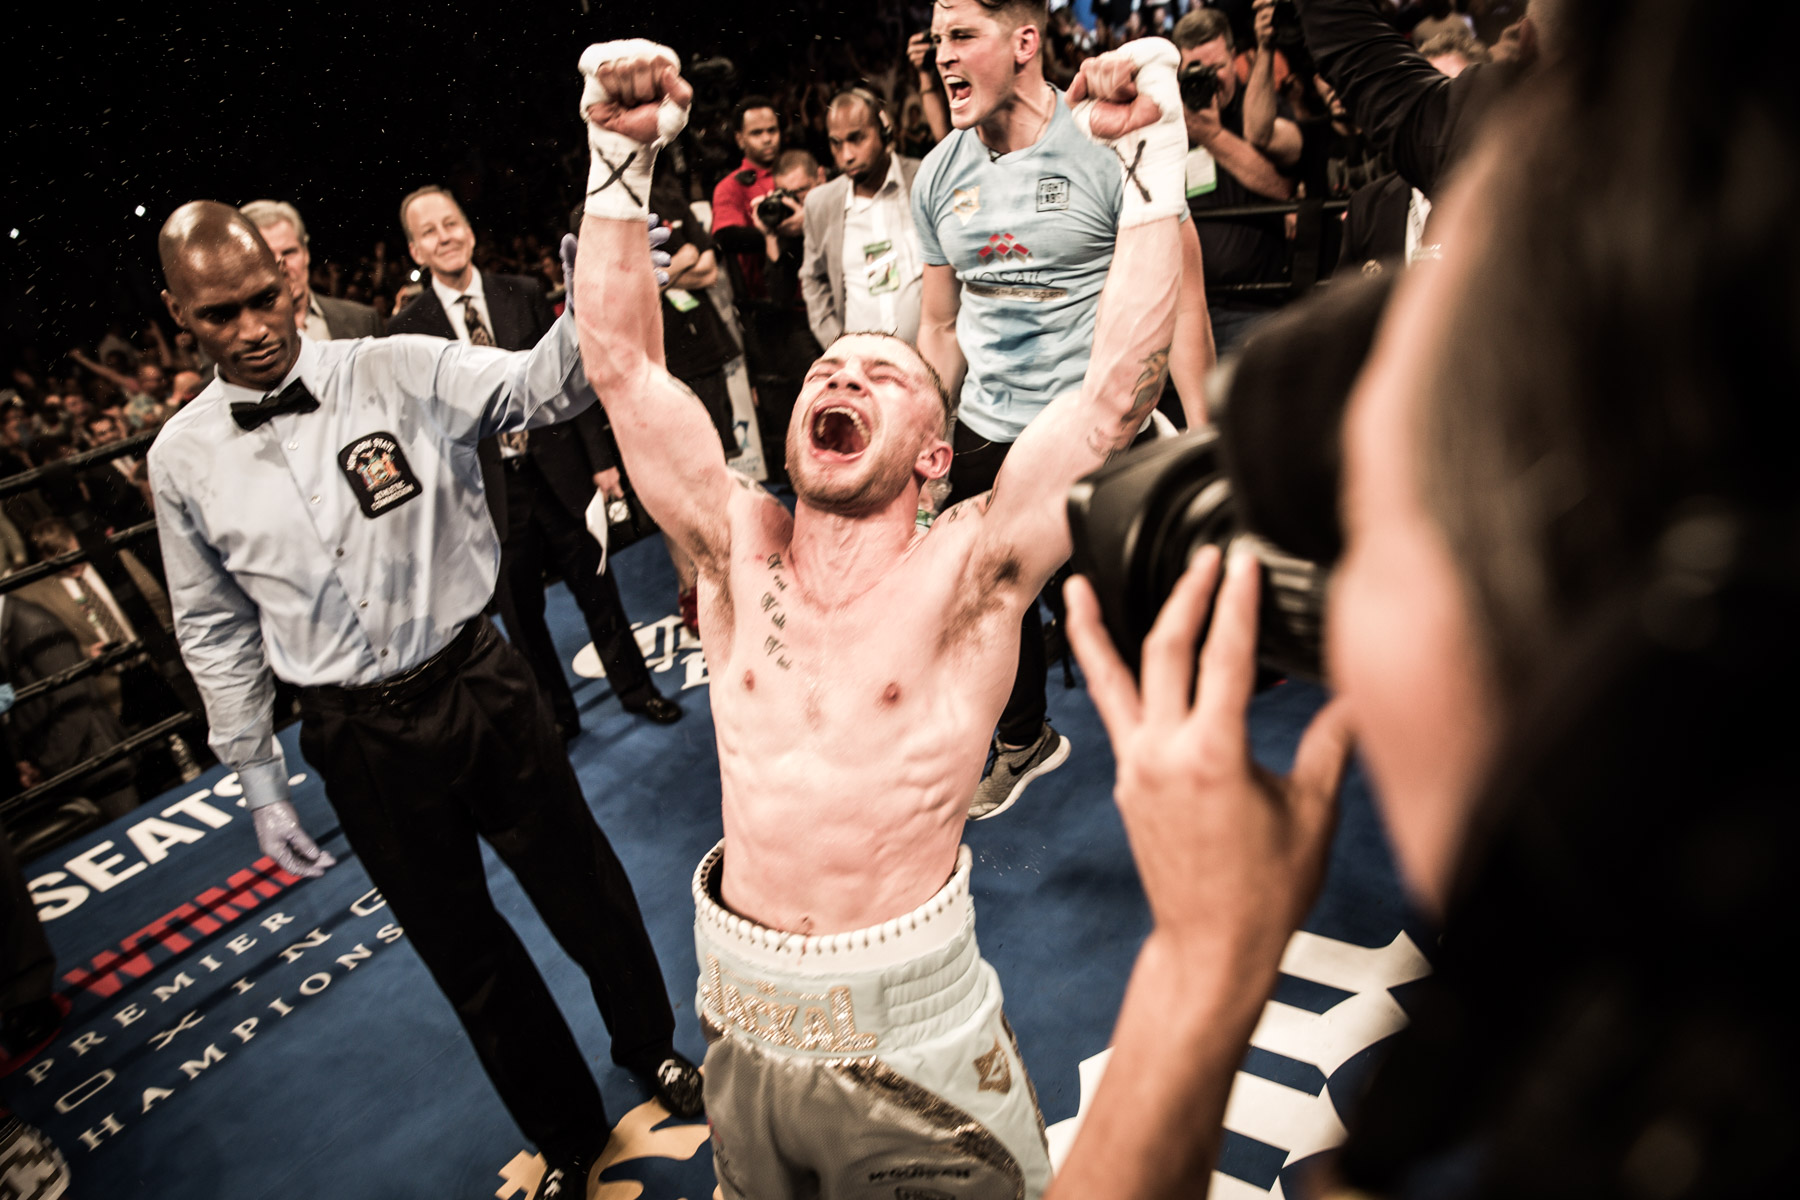 Carl Frampton celebrates after hearing the judges' scorecards in his favor. Photo: AmandaWestcott/SHOWTIME.